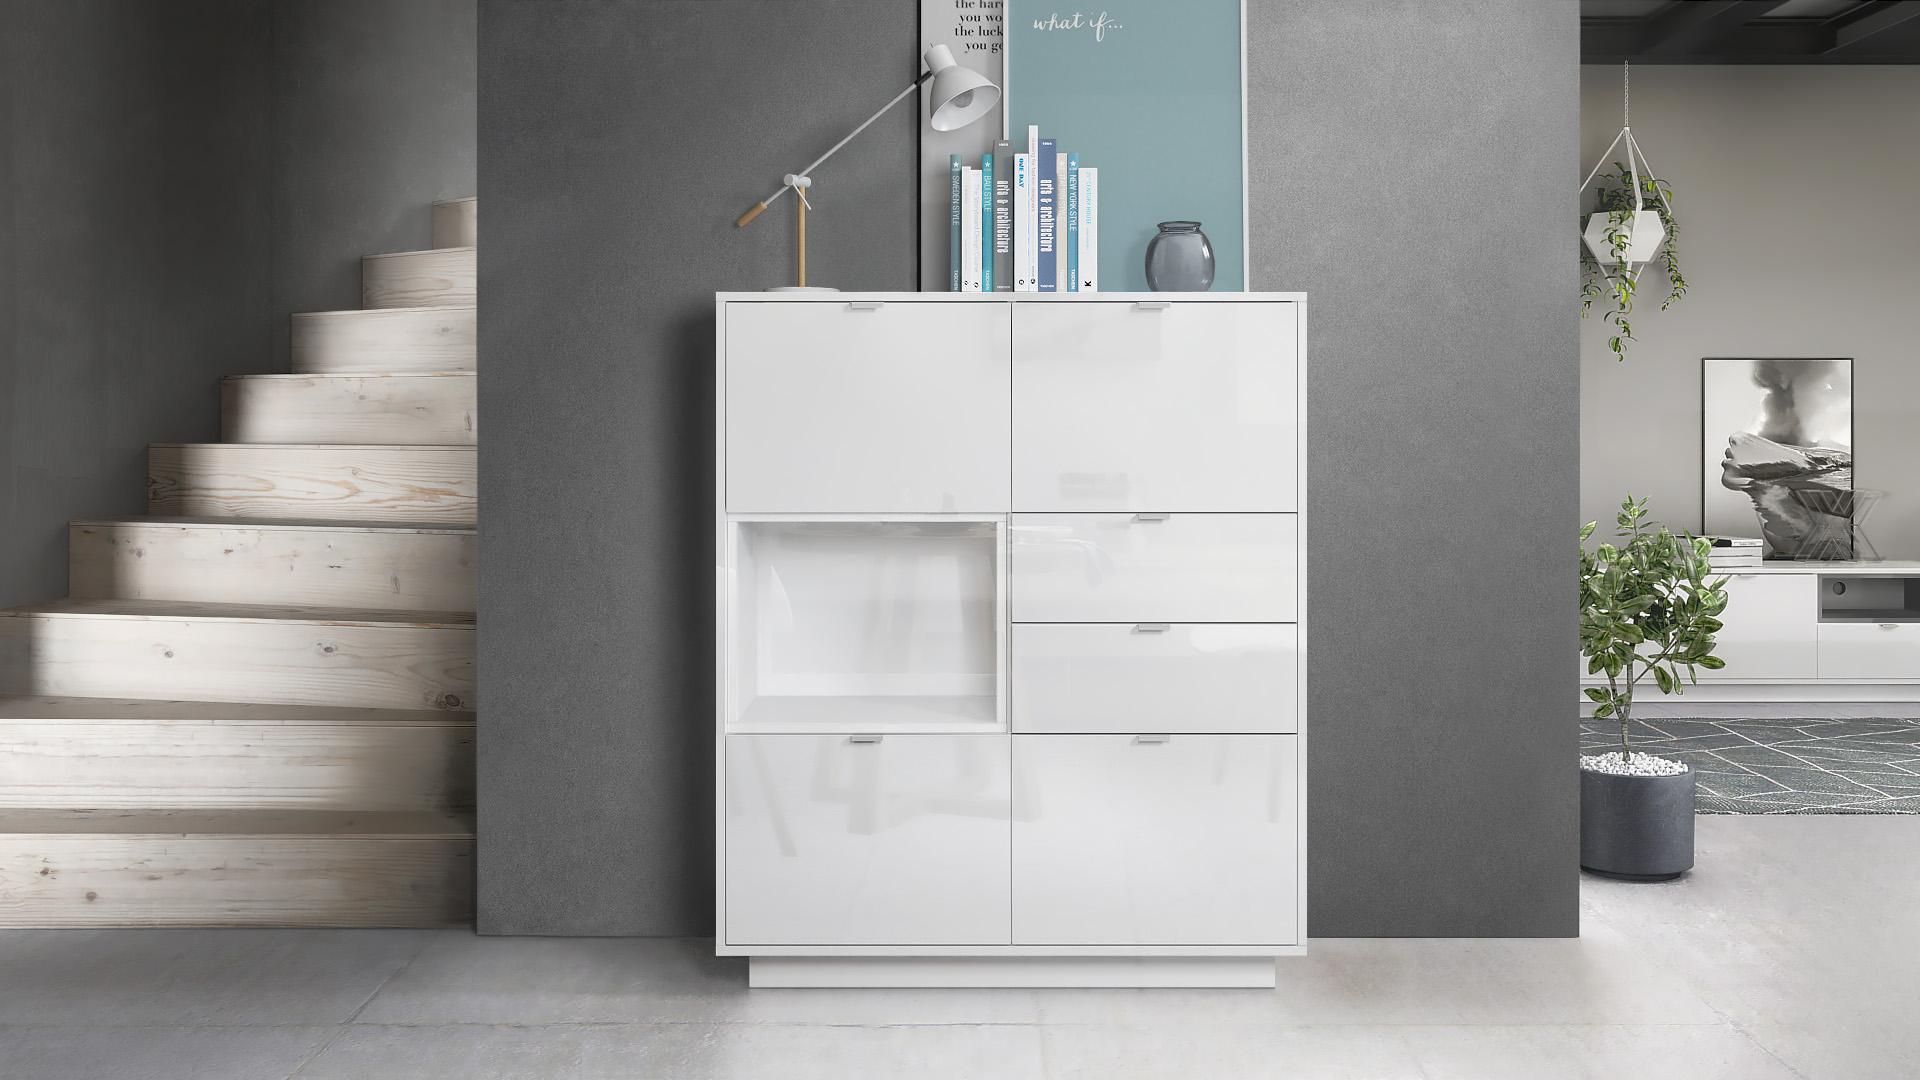 highboard metro schrank sideboard kommode anrichte wei. Black Bedroom Furniture Sets. Home Design Ideas